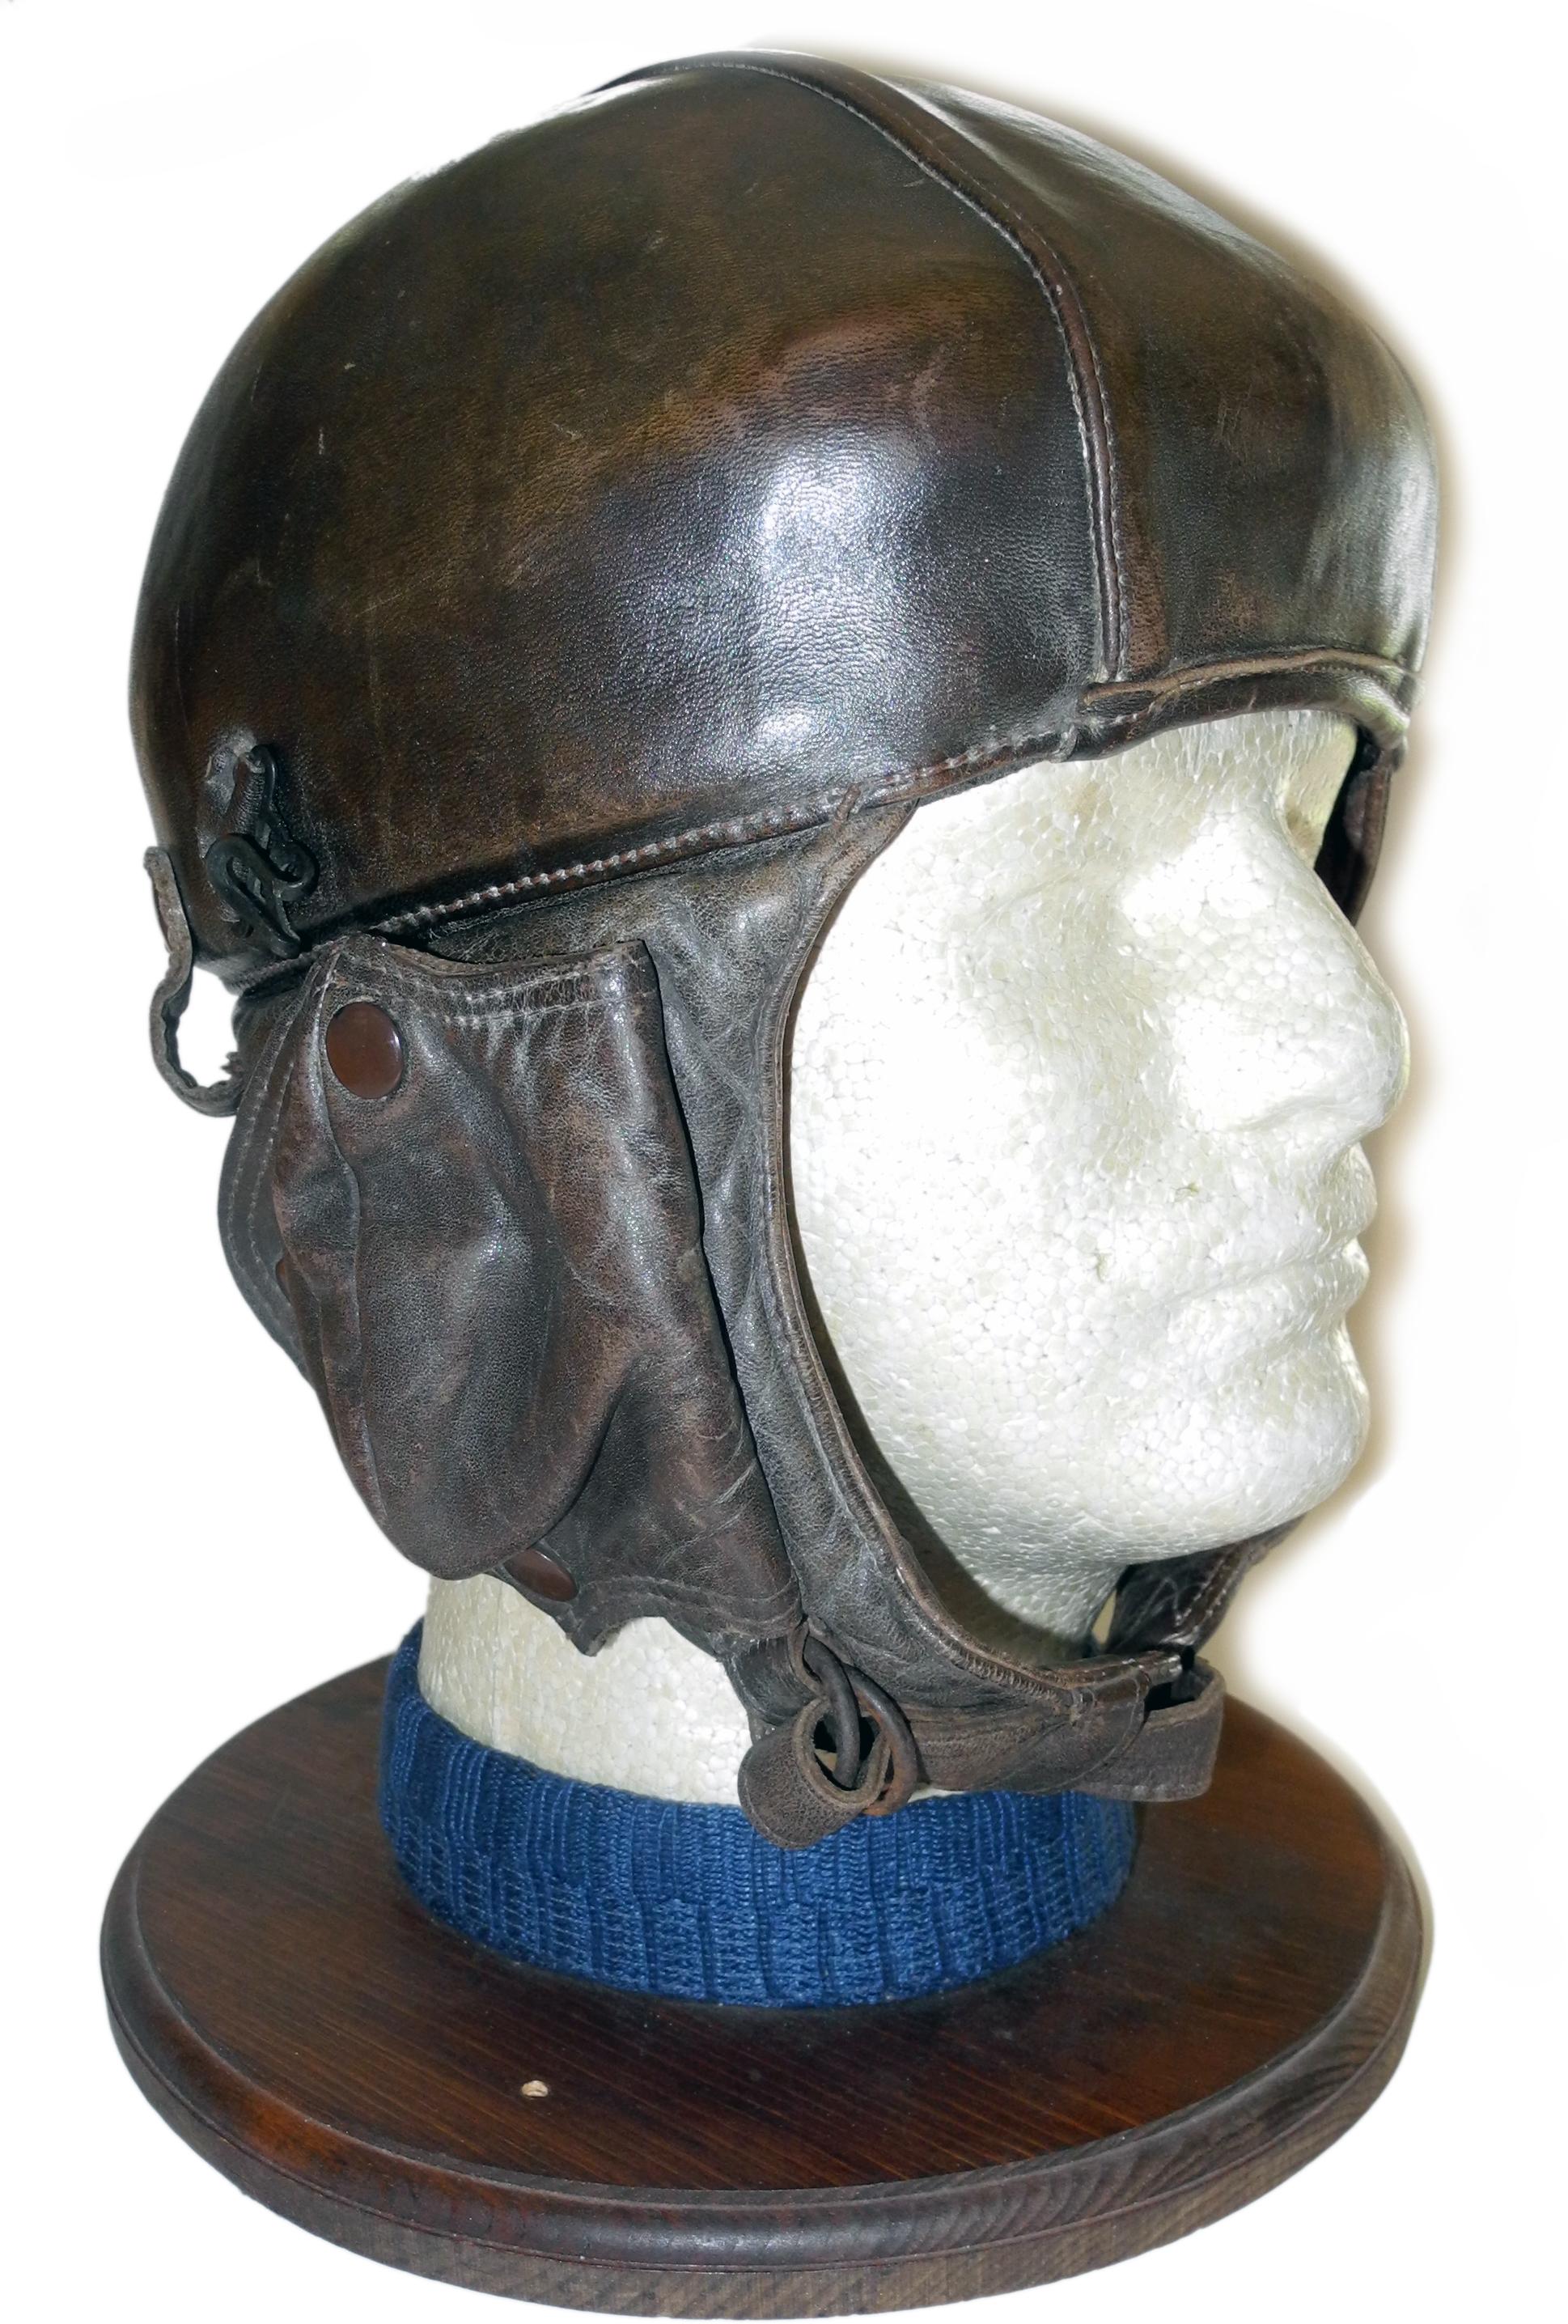 French Type 11 flying helmet